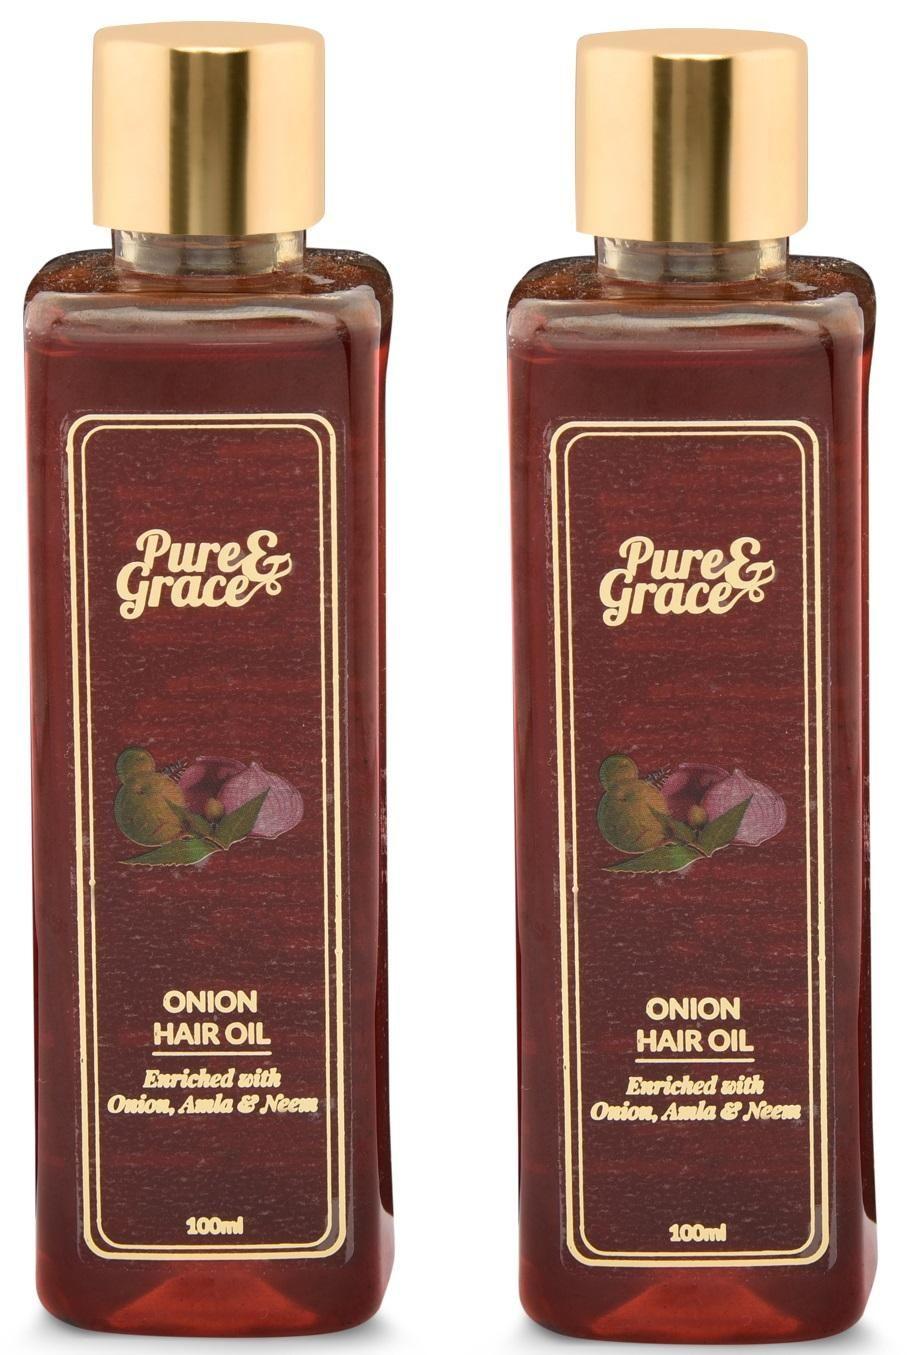 Pure & Grace Onion Hair Oil